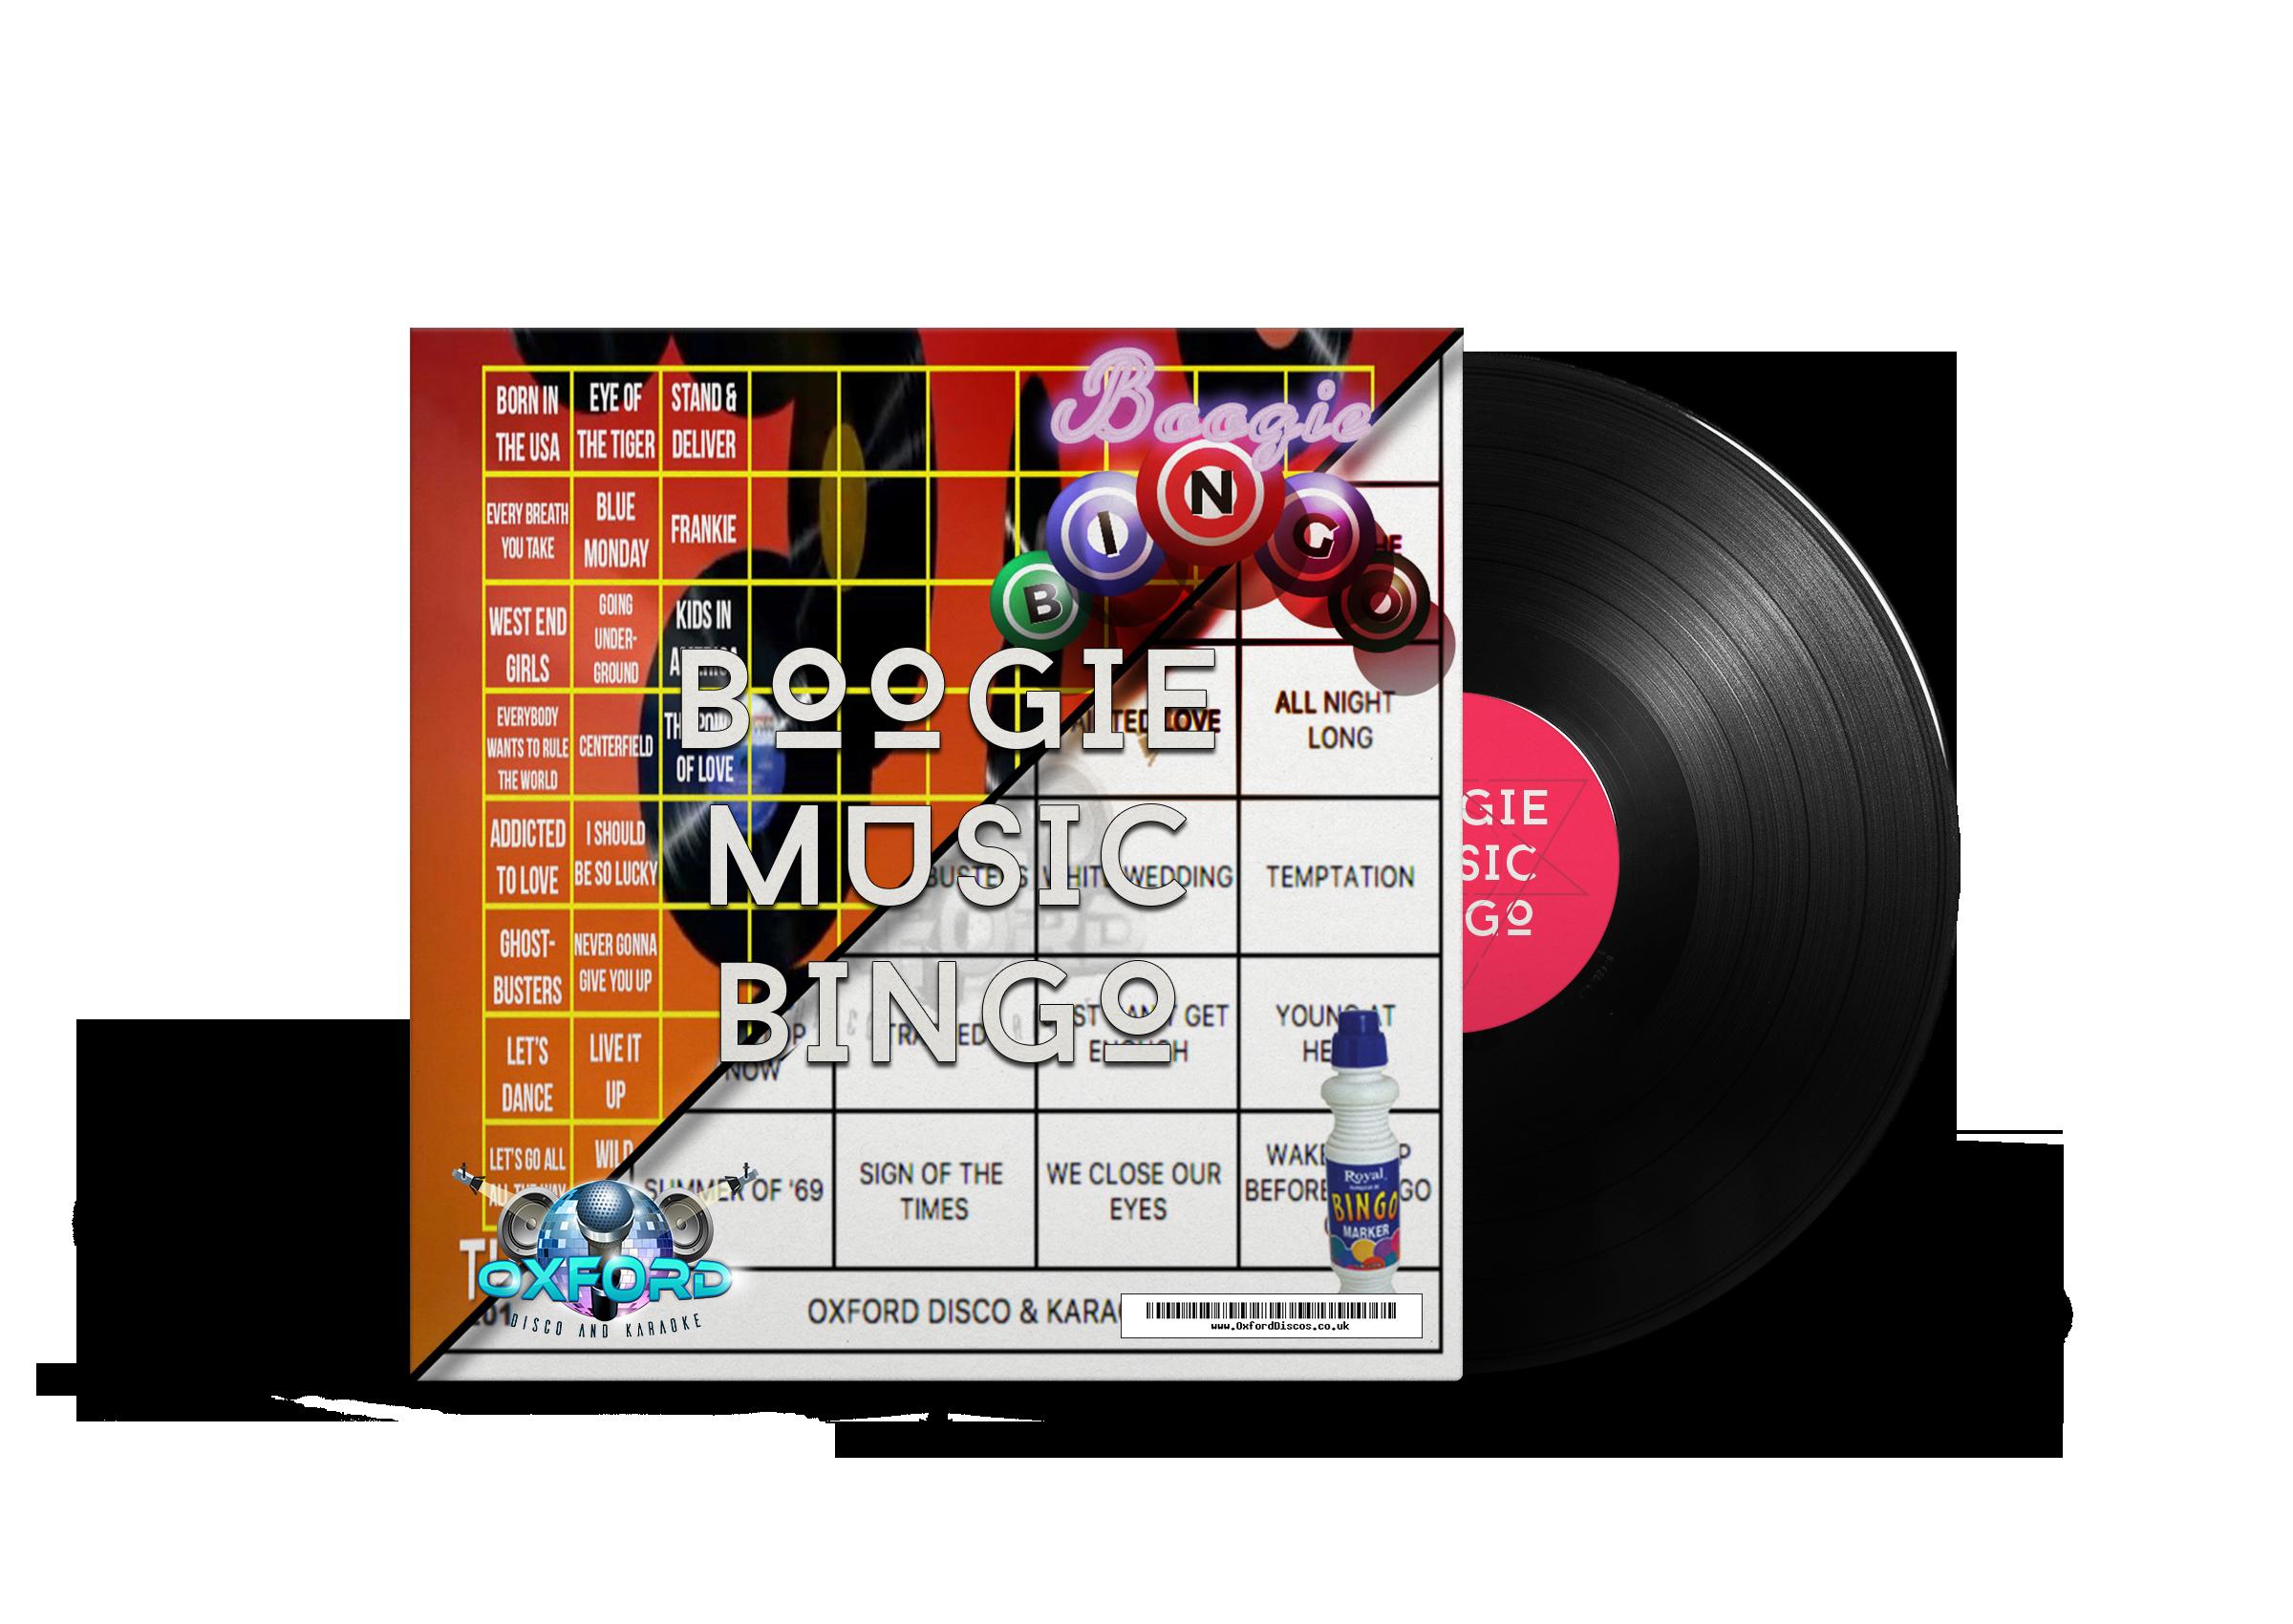 Boogie Music Bingo - Oxford Disco And Karaoke